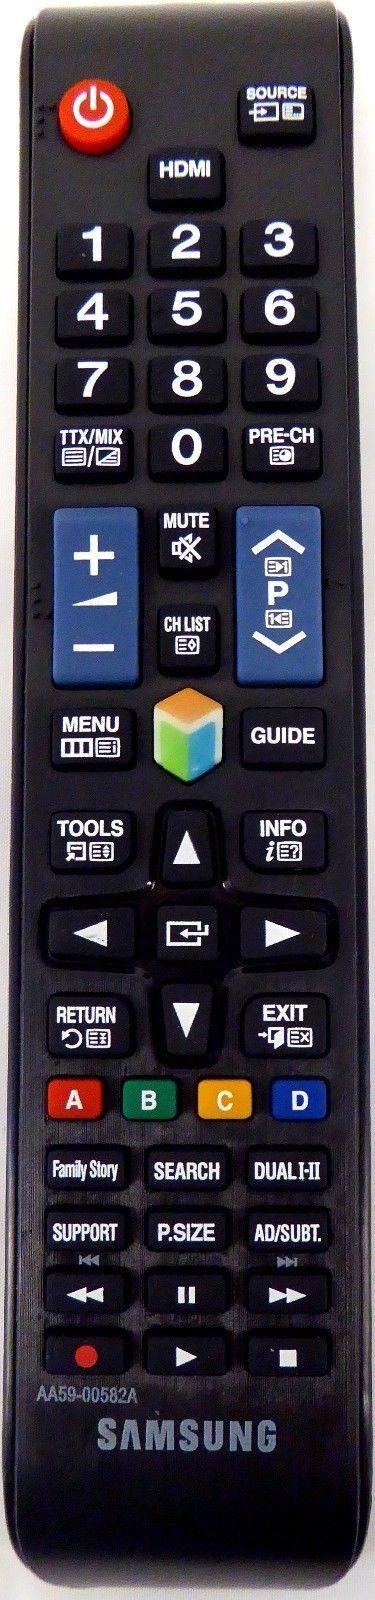 Samsung Remote Control AA59-00582A Smart TV UN32EH4500 UN46ES6100F UN32EH5300